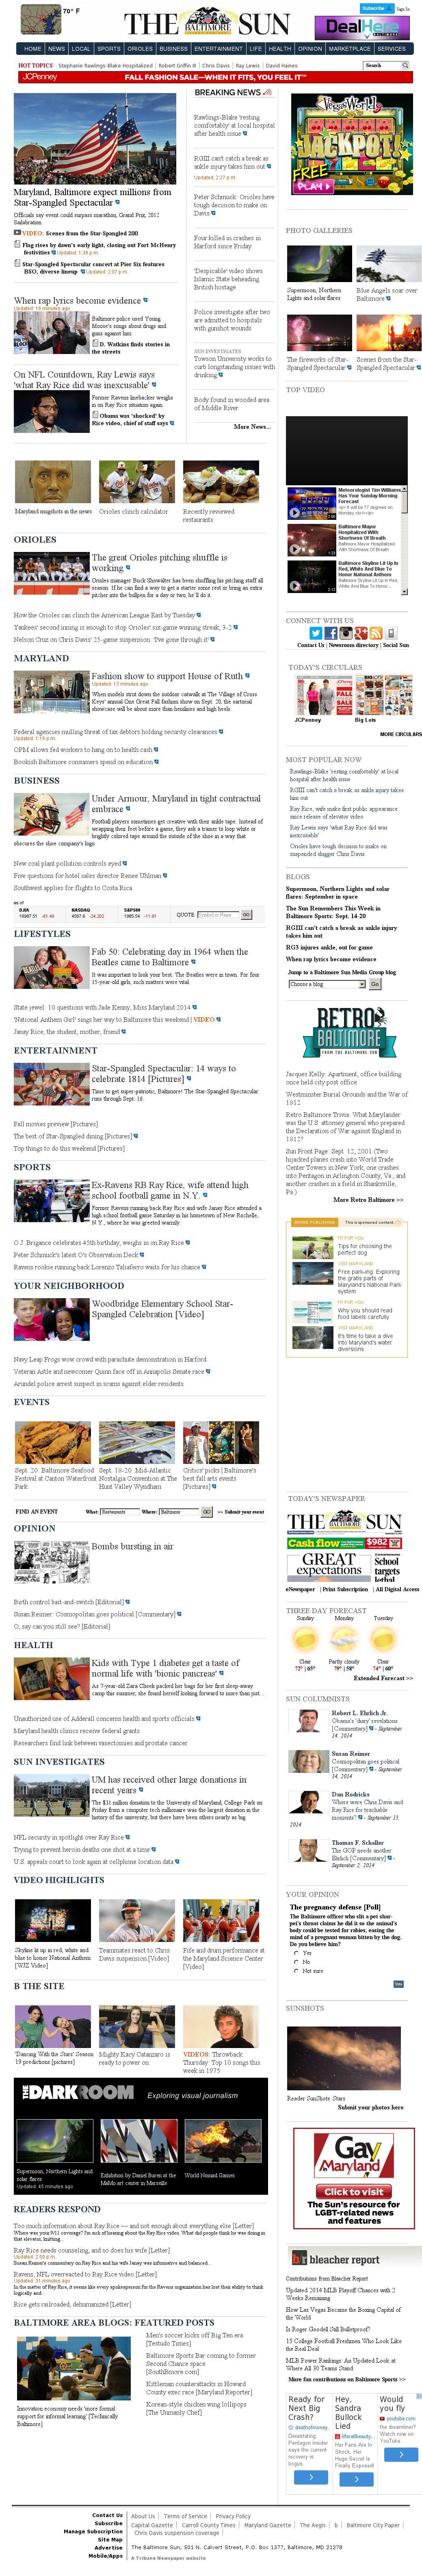 The Baltimore Sun at Sunday Sept. 14, 2014, 8 p.m. UTC